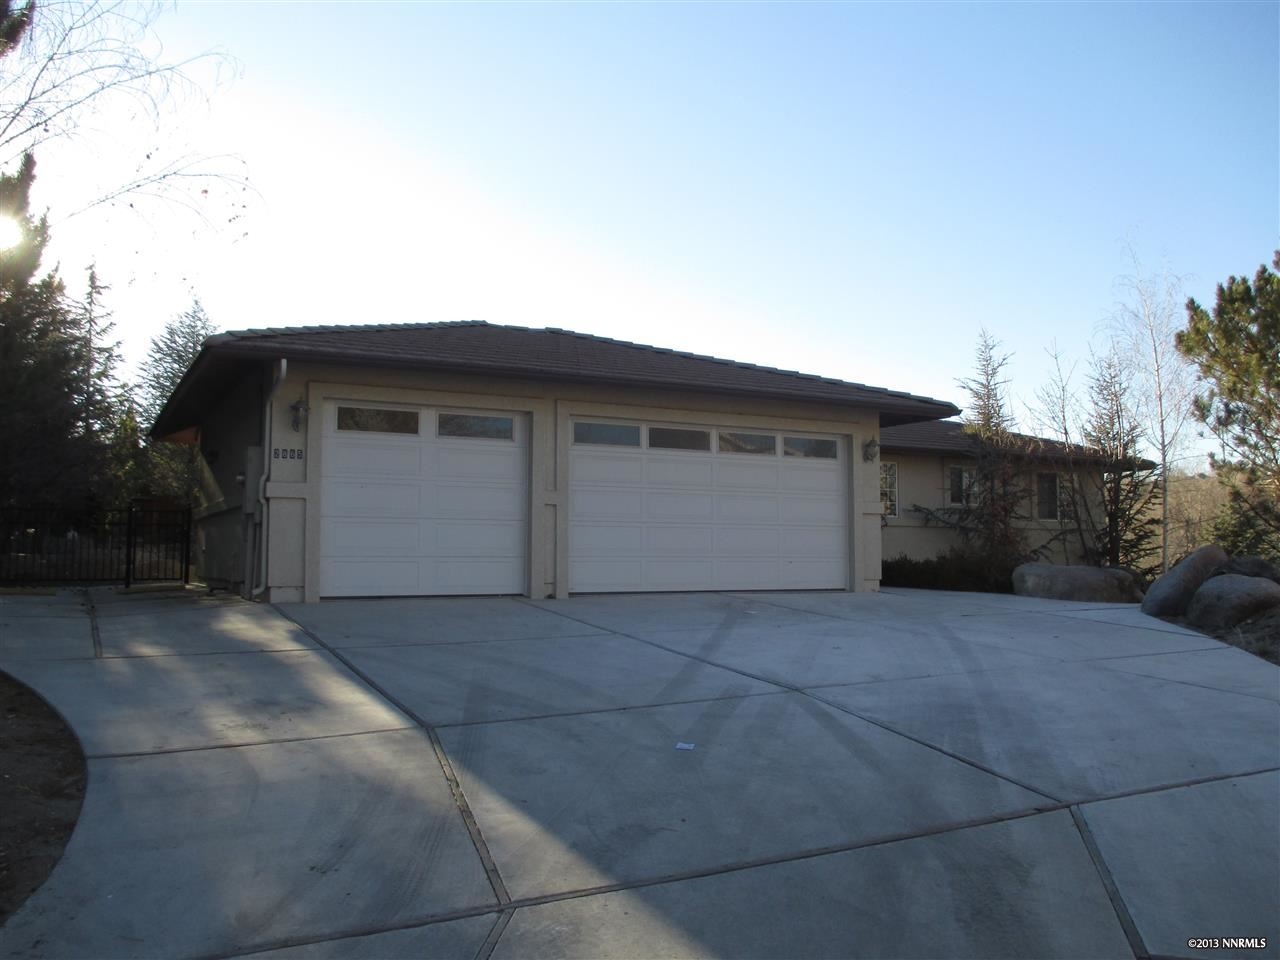 2865 W Pinenut Ct, Reno NV 89509